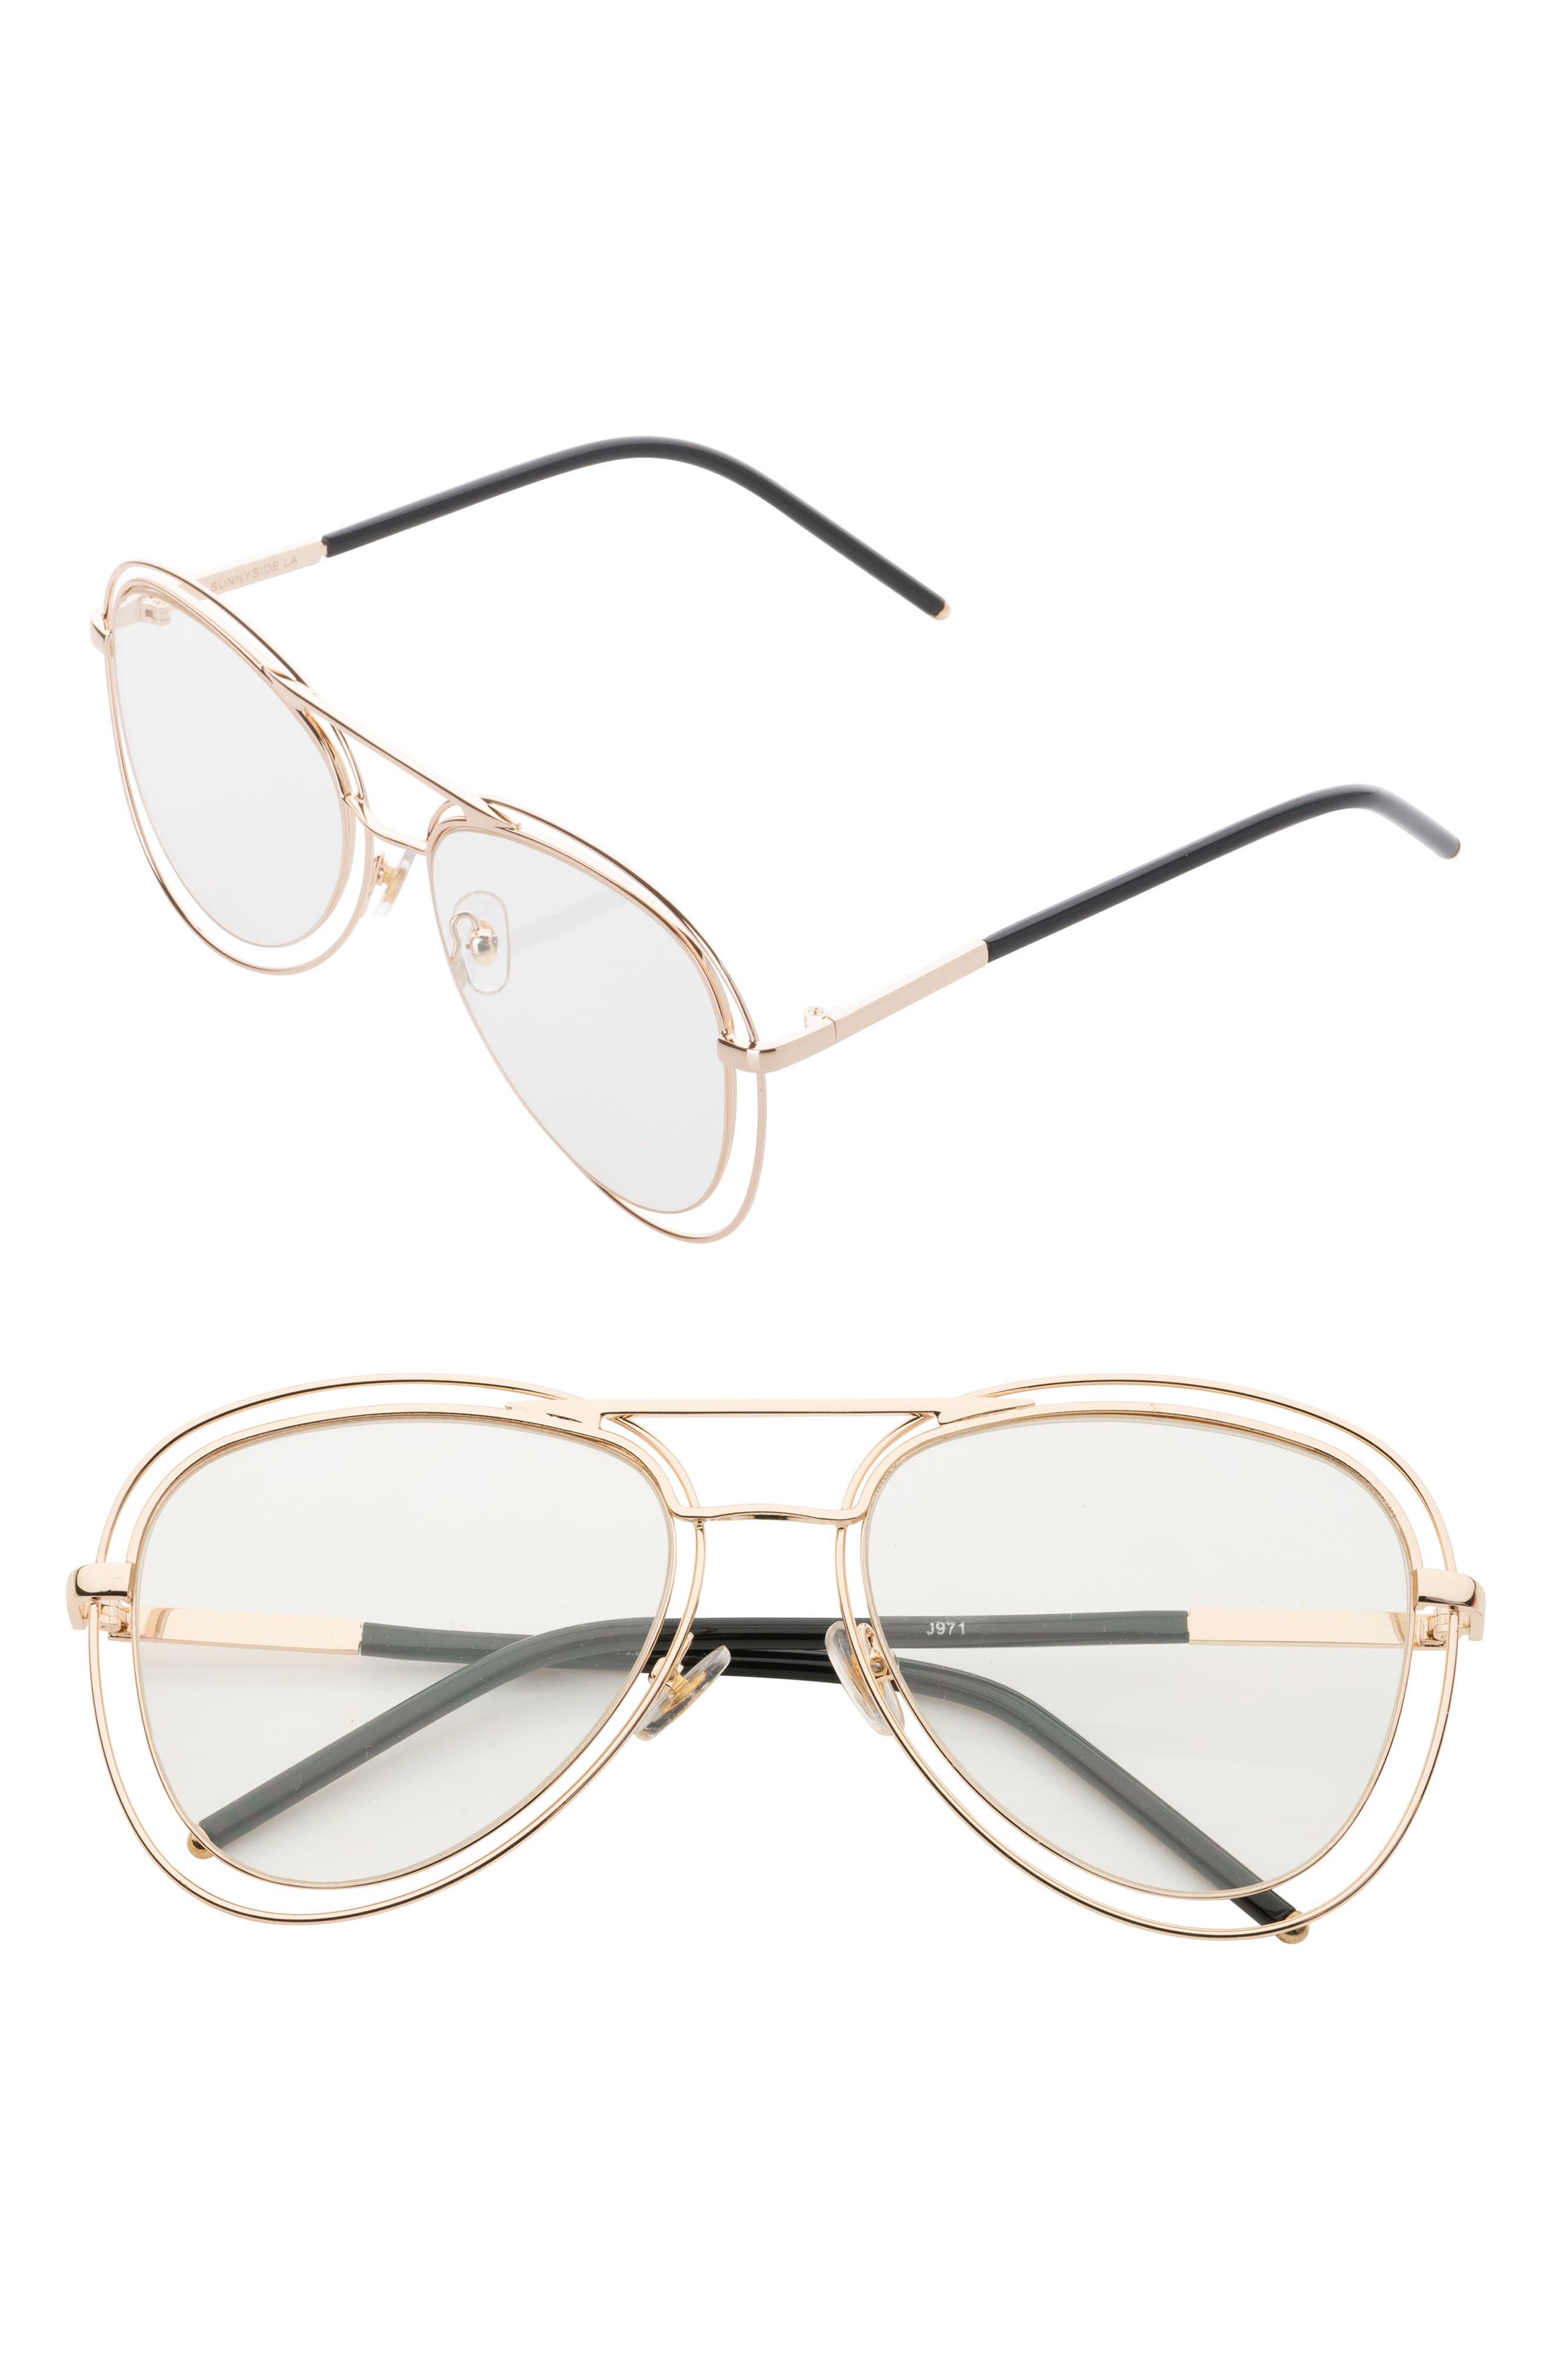 55mm Aviator Fashion Glasses,                         Main,                         color, Gold